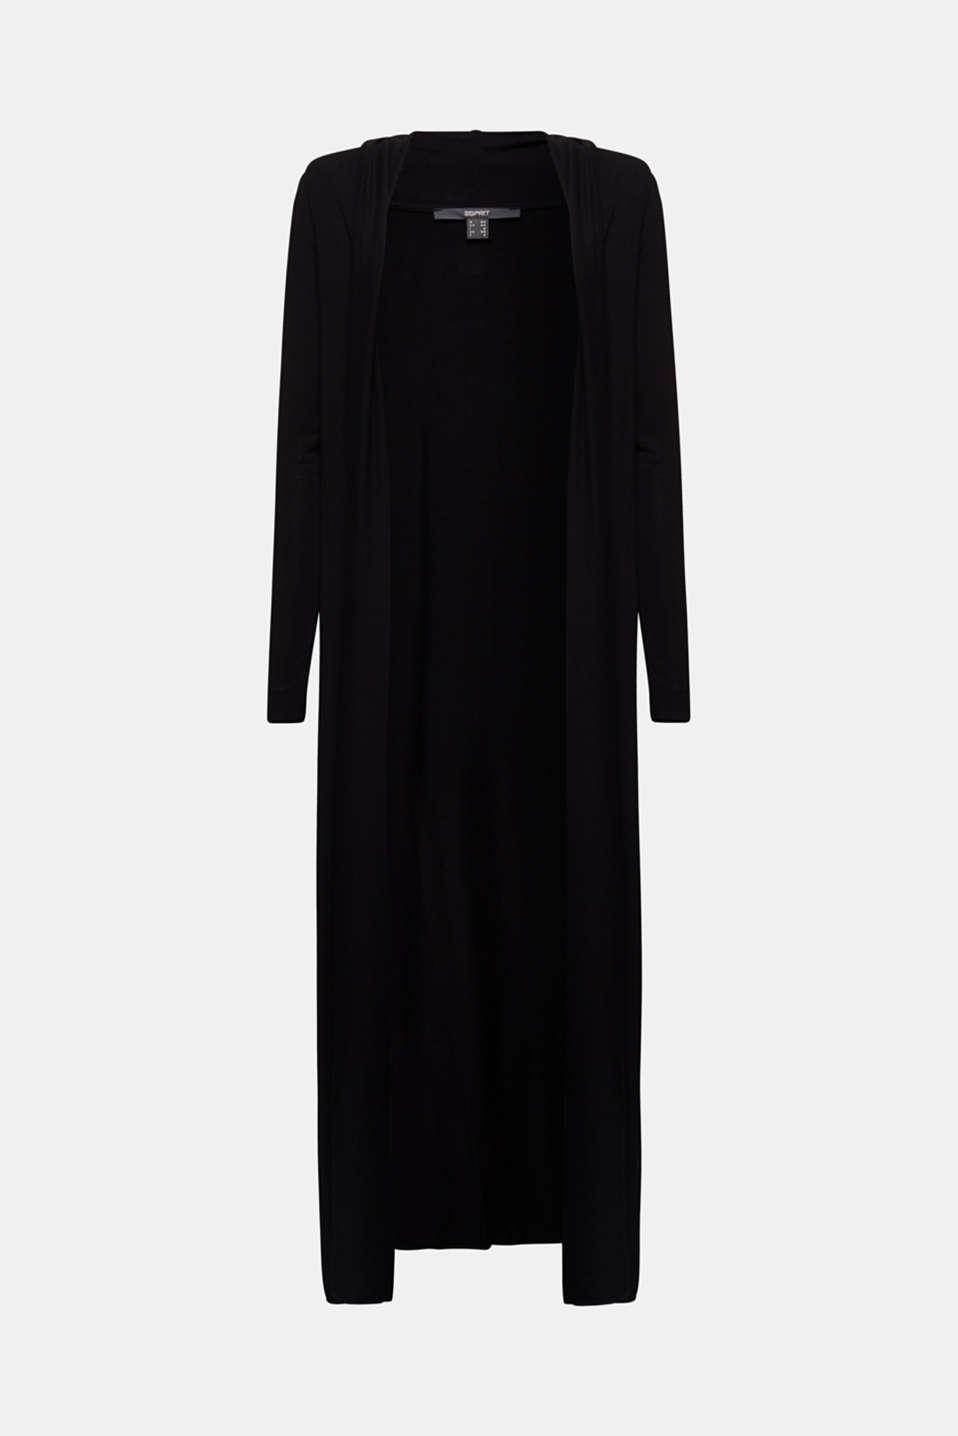 Flowing long jersey cardigan, BLACK, detail image number 5